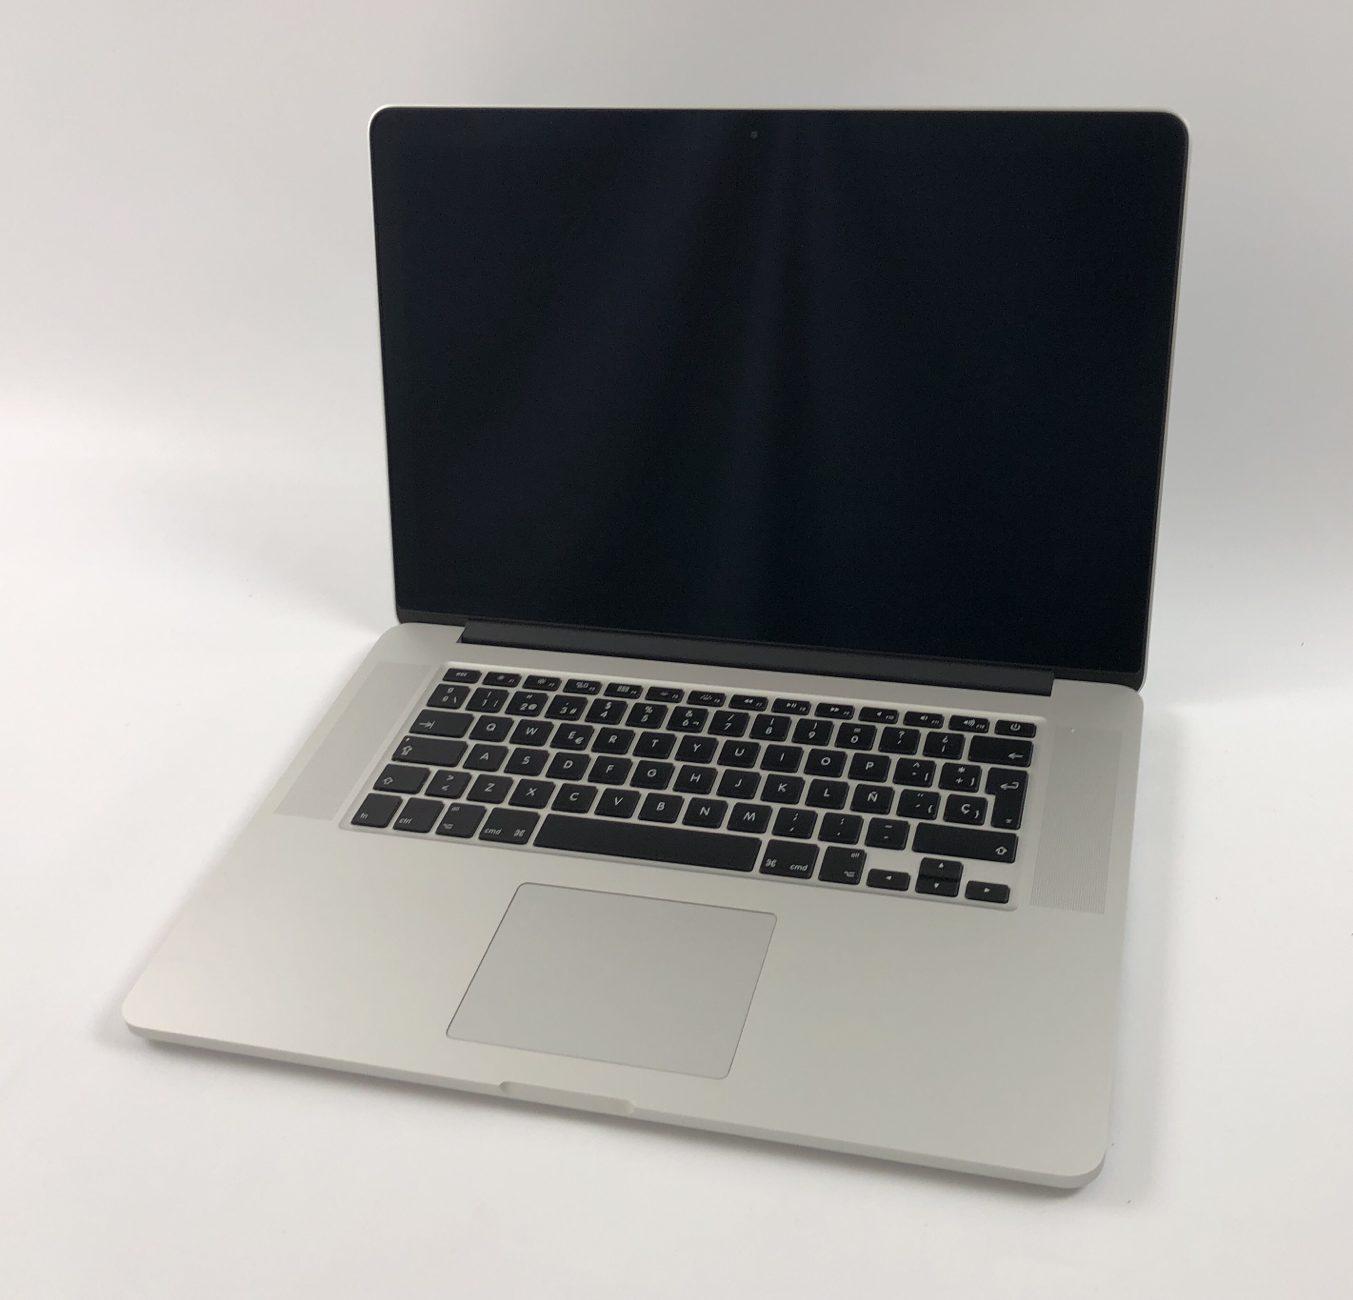 "MacBook Pro Retina 15"" Early 2013 (Intel Quad-Core i7 2.4 GHz 8 GB RAM 256 GB SSD), Intel Quad-Core i7 2.4 GHz, 8 GB RAM, 256 GB SSD, imagen 1"